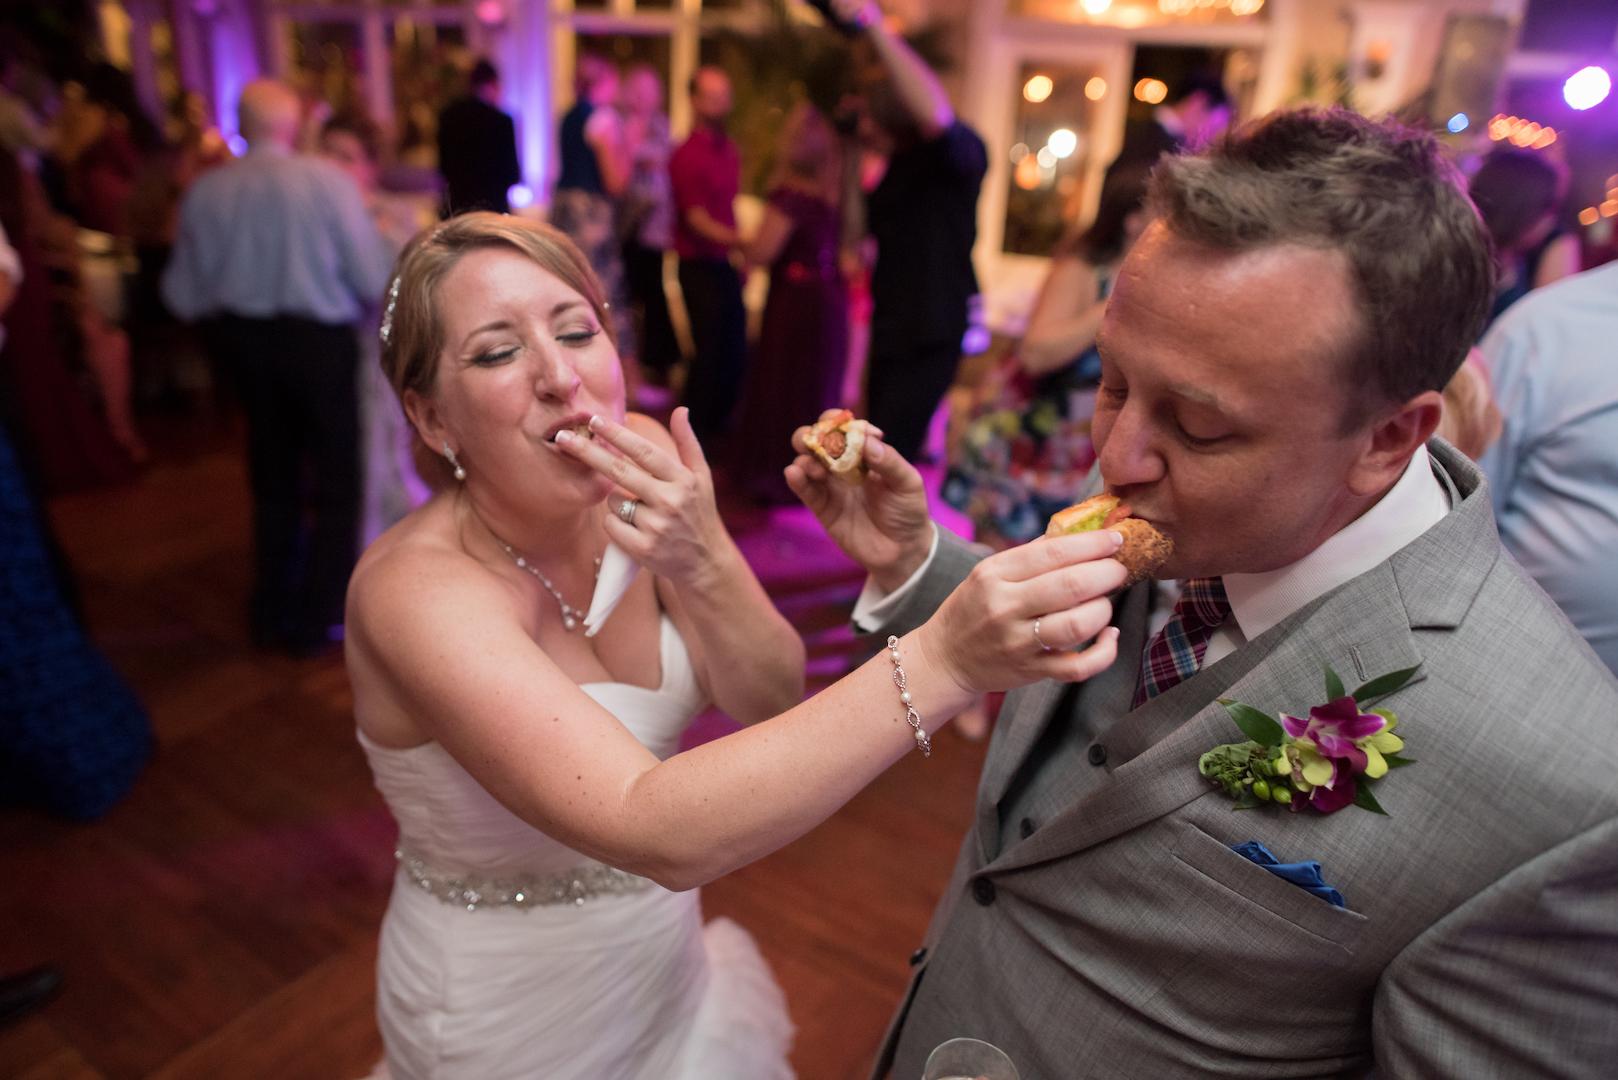 st-augustine-wedding-photographer-memorial-presbyterian-wedding-creative-84.jpg